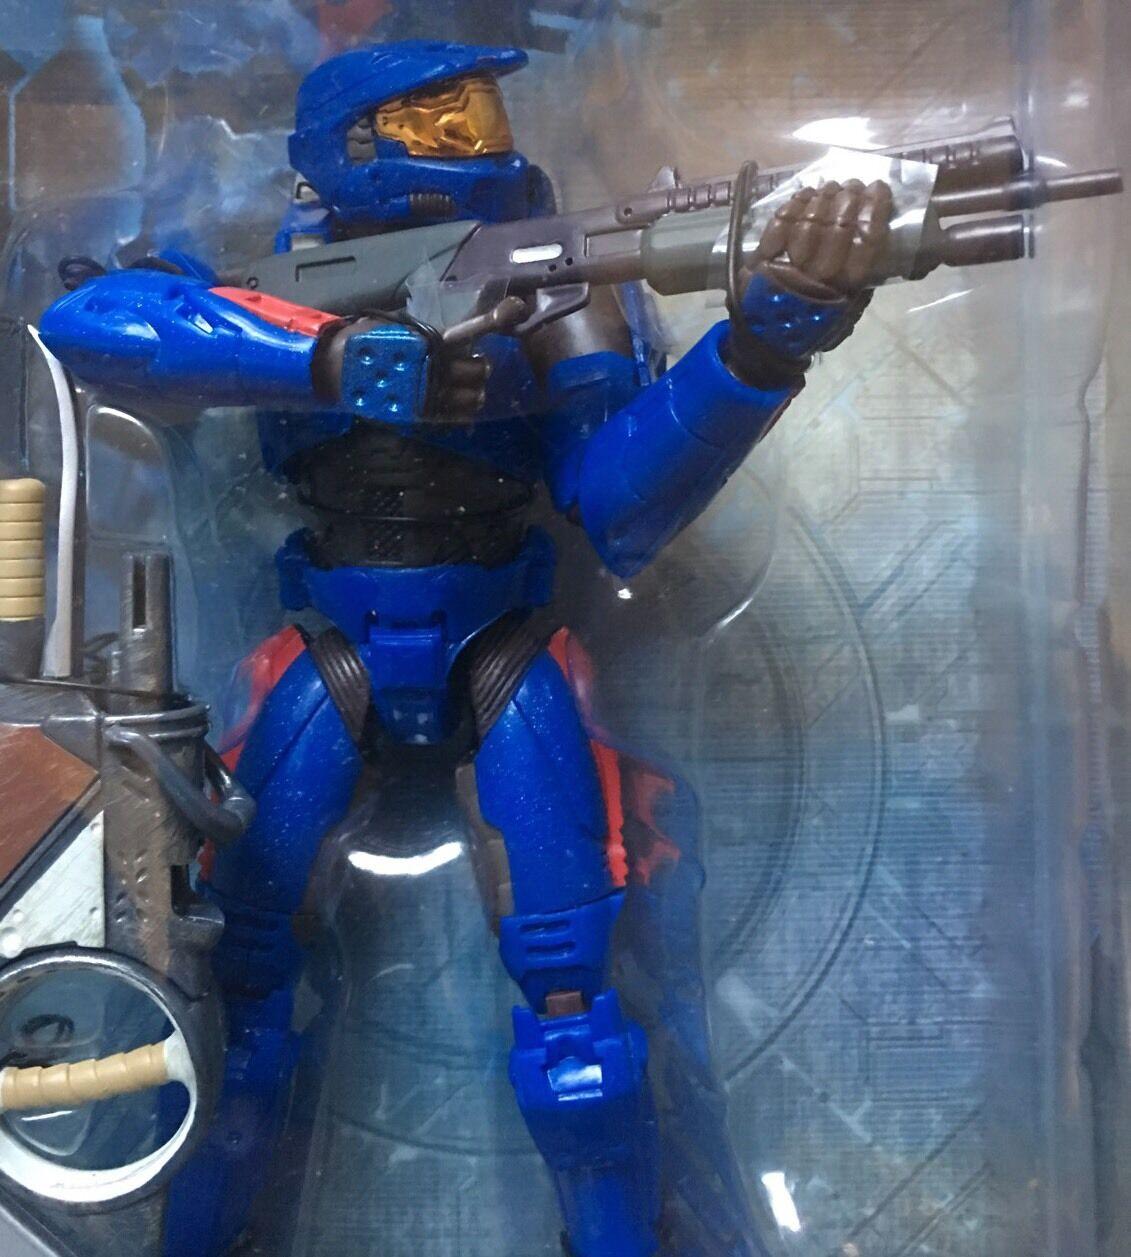 RARA GRANDE Joyride Halo 2 Series 3 Blu Spartan Rosso monmc FACTORY Fresh Bubble